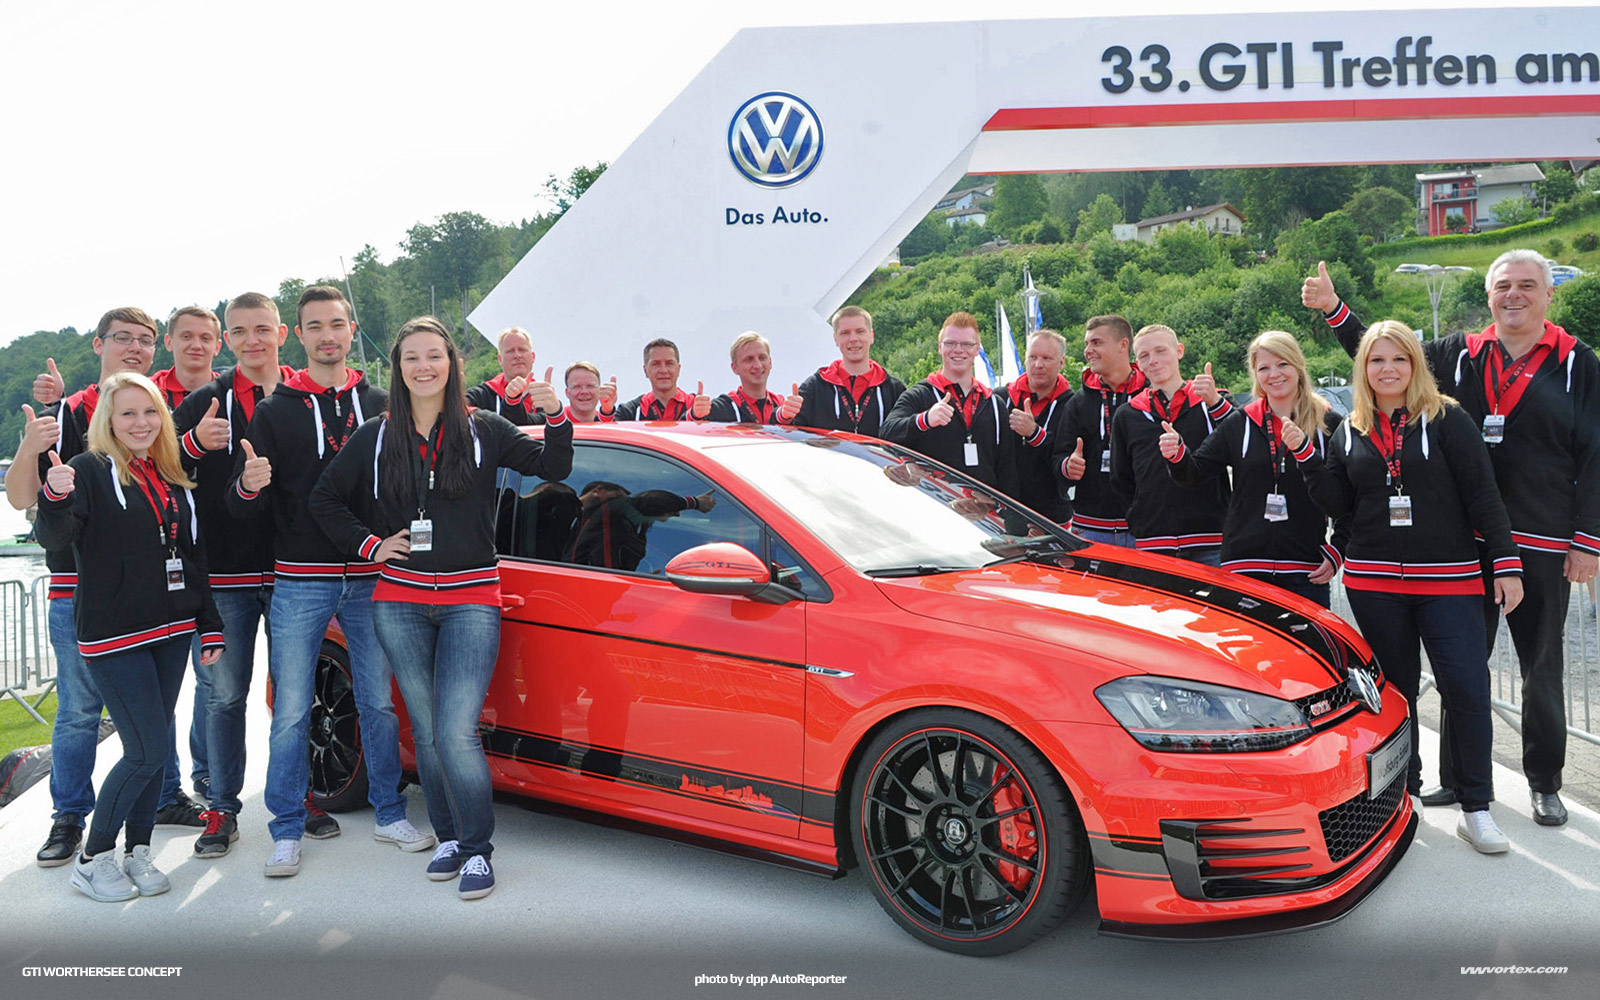 Volkswagen Worthersee GTI concept 363 150x150